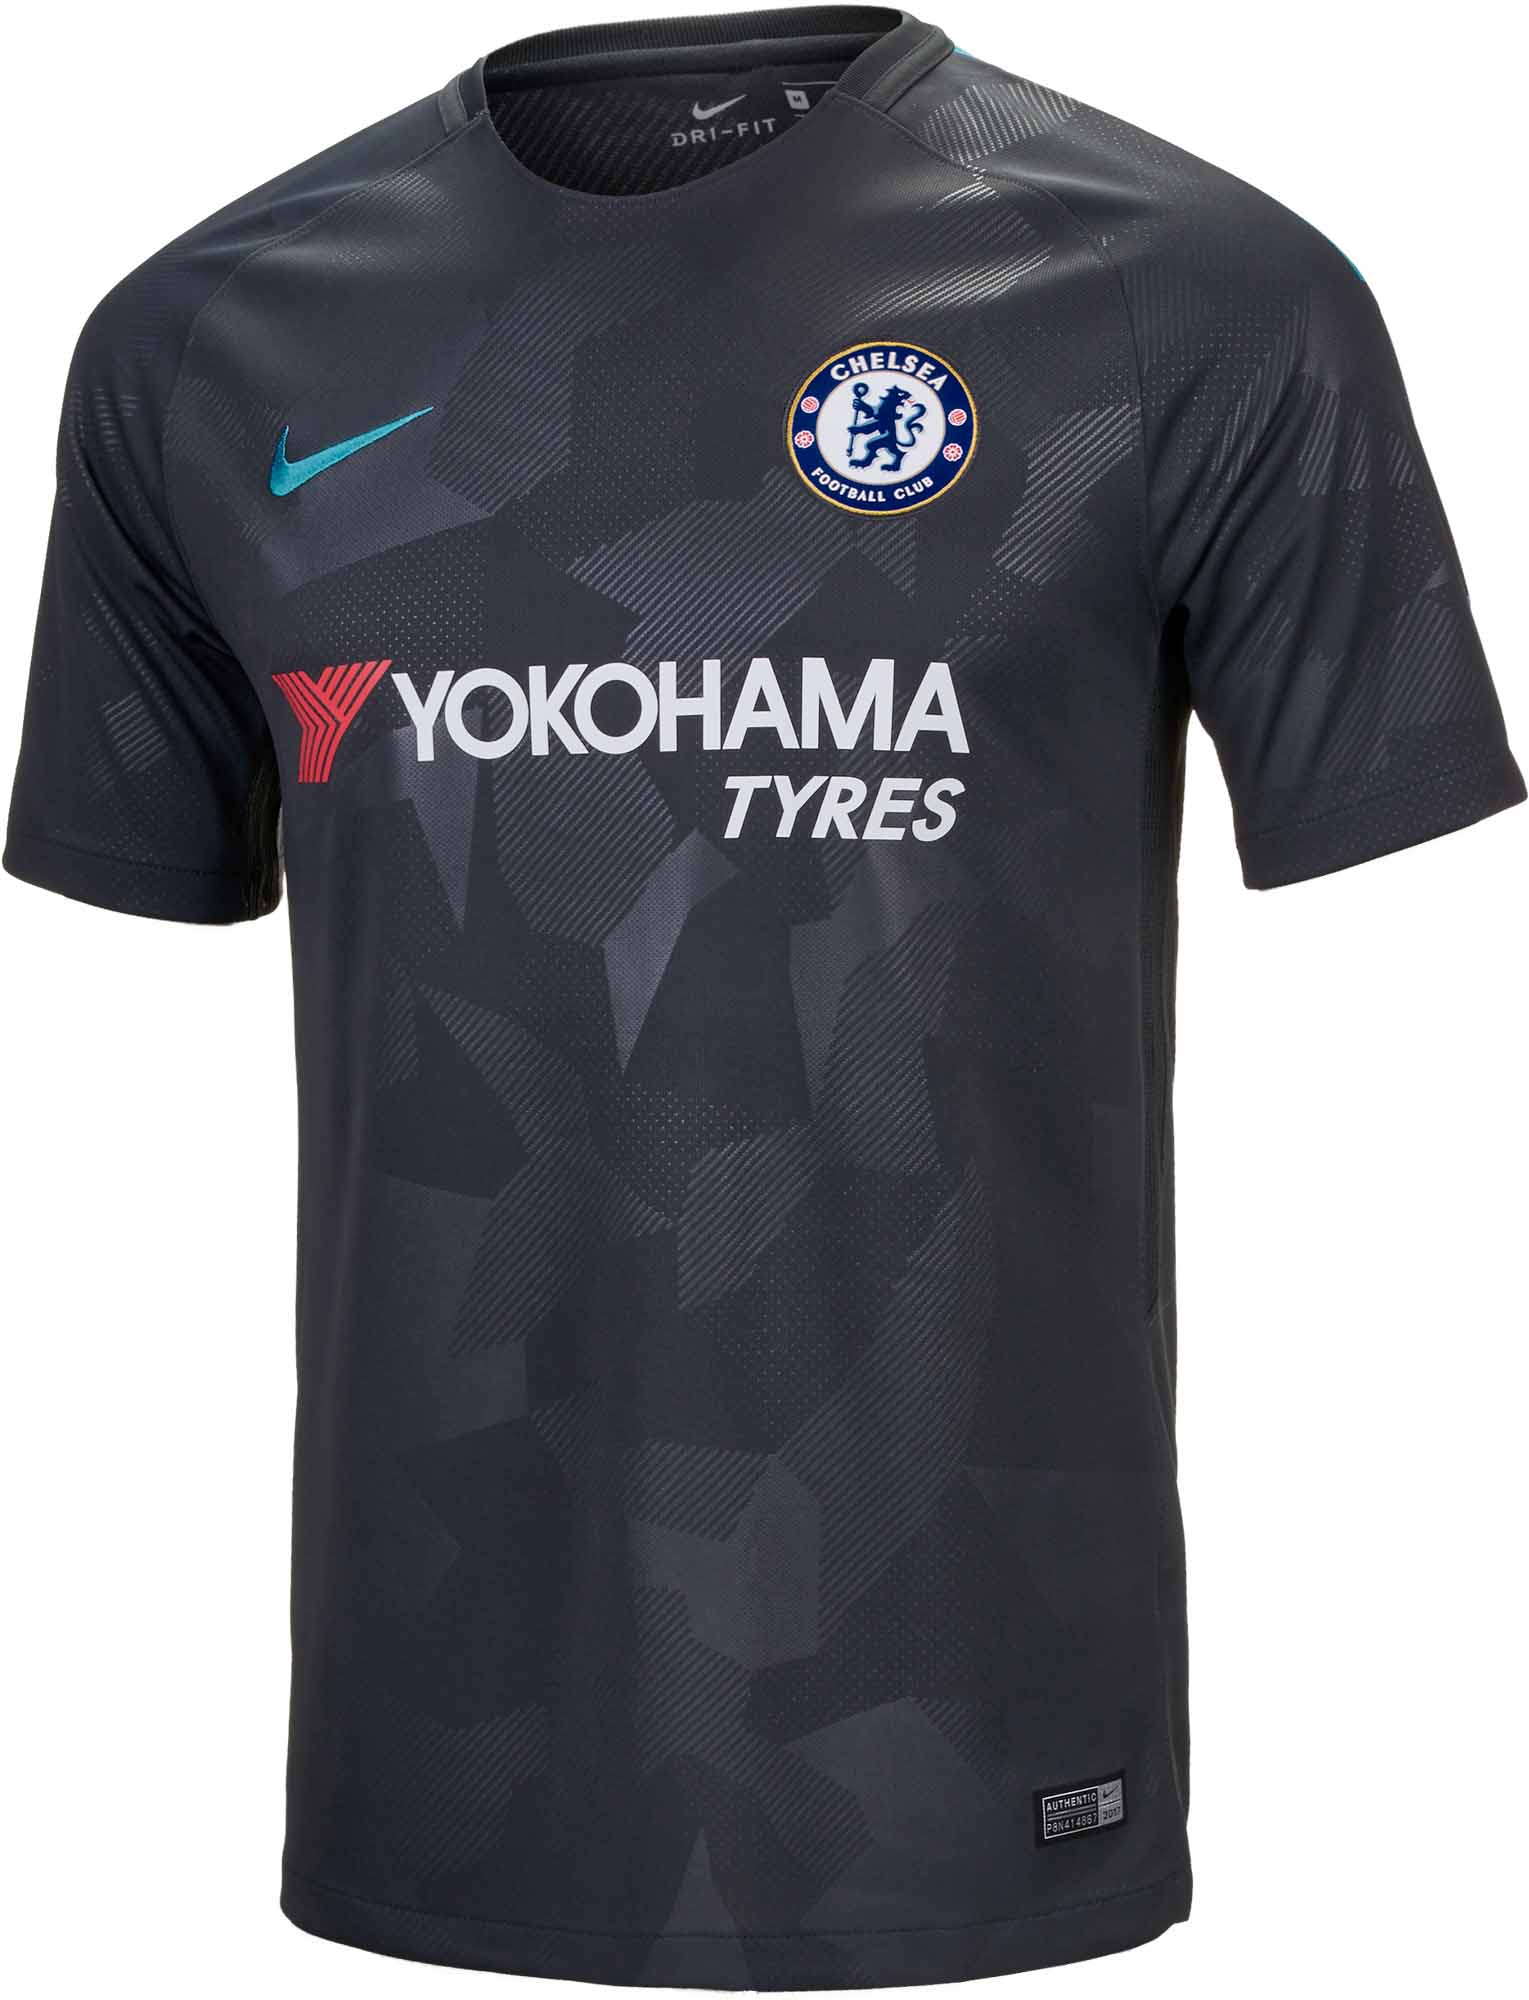 5b45aba6 Nike Chelsea 3rd Jersey 2017-18 - Soccer Master